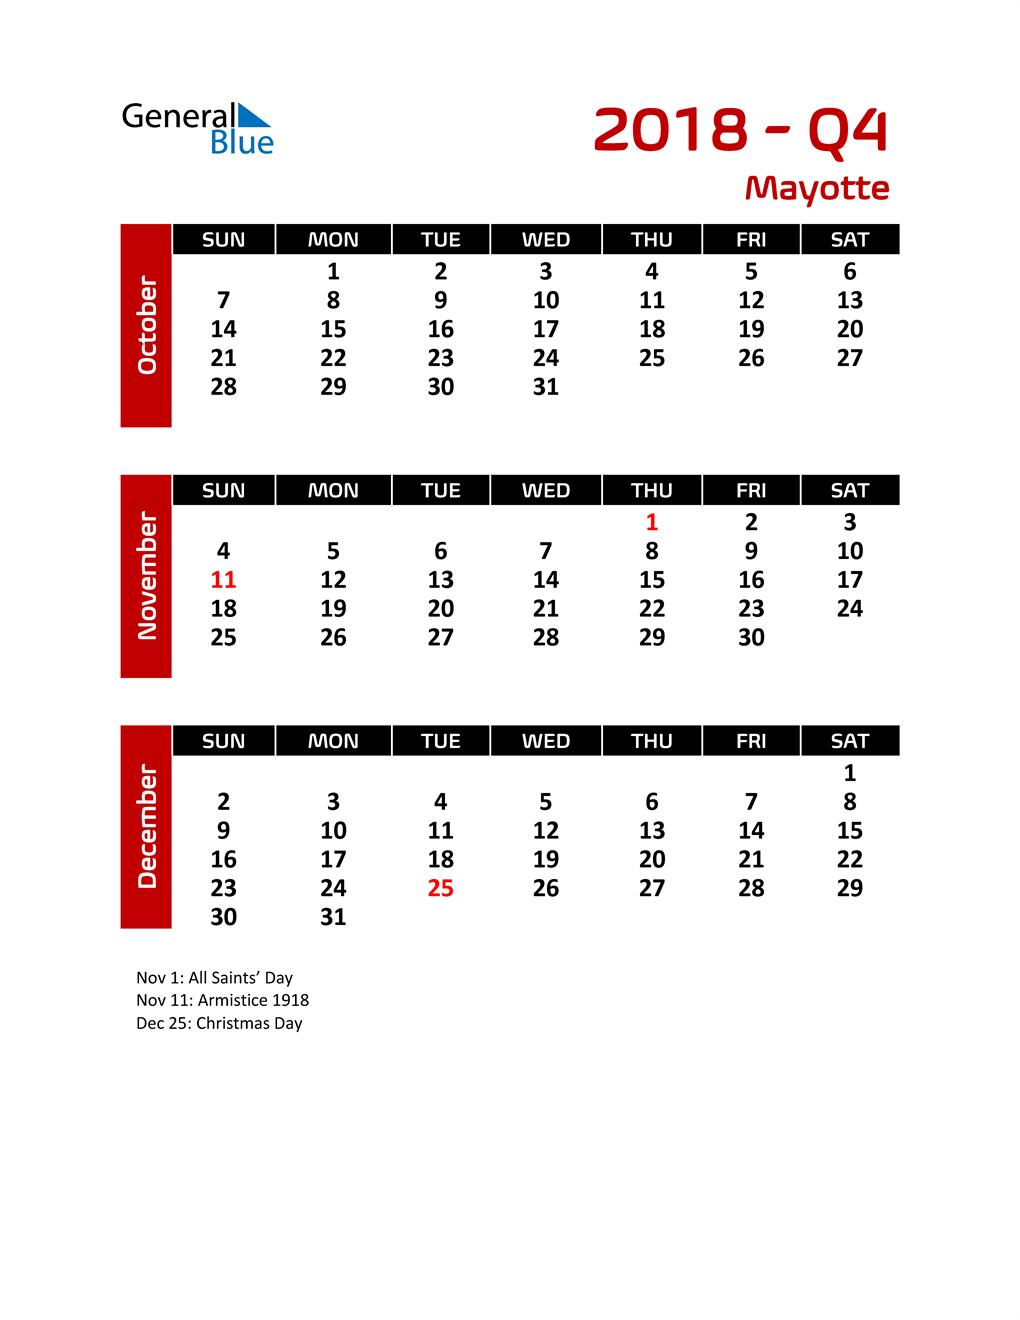 Q4 2018 Calendar with Holidays